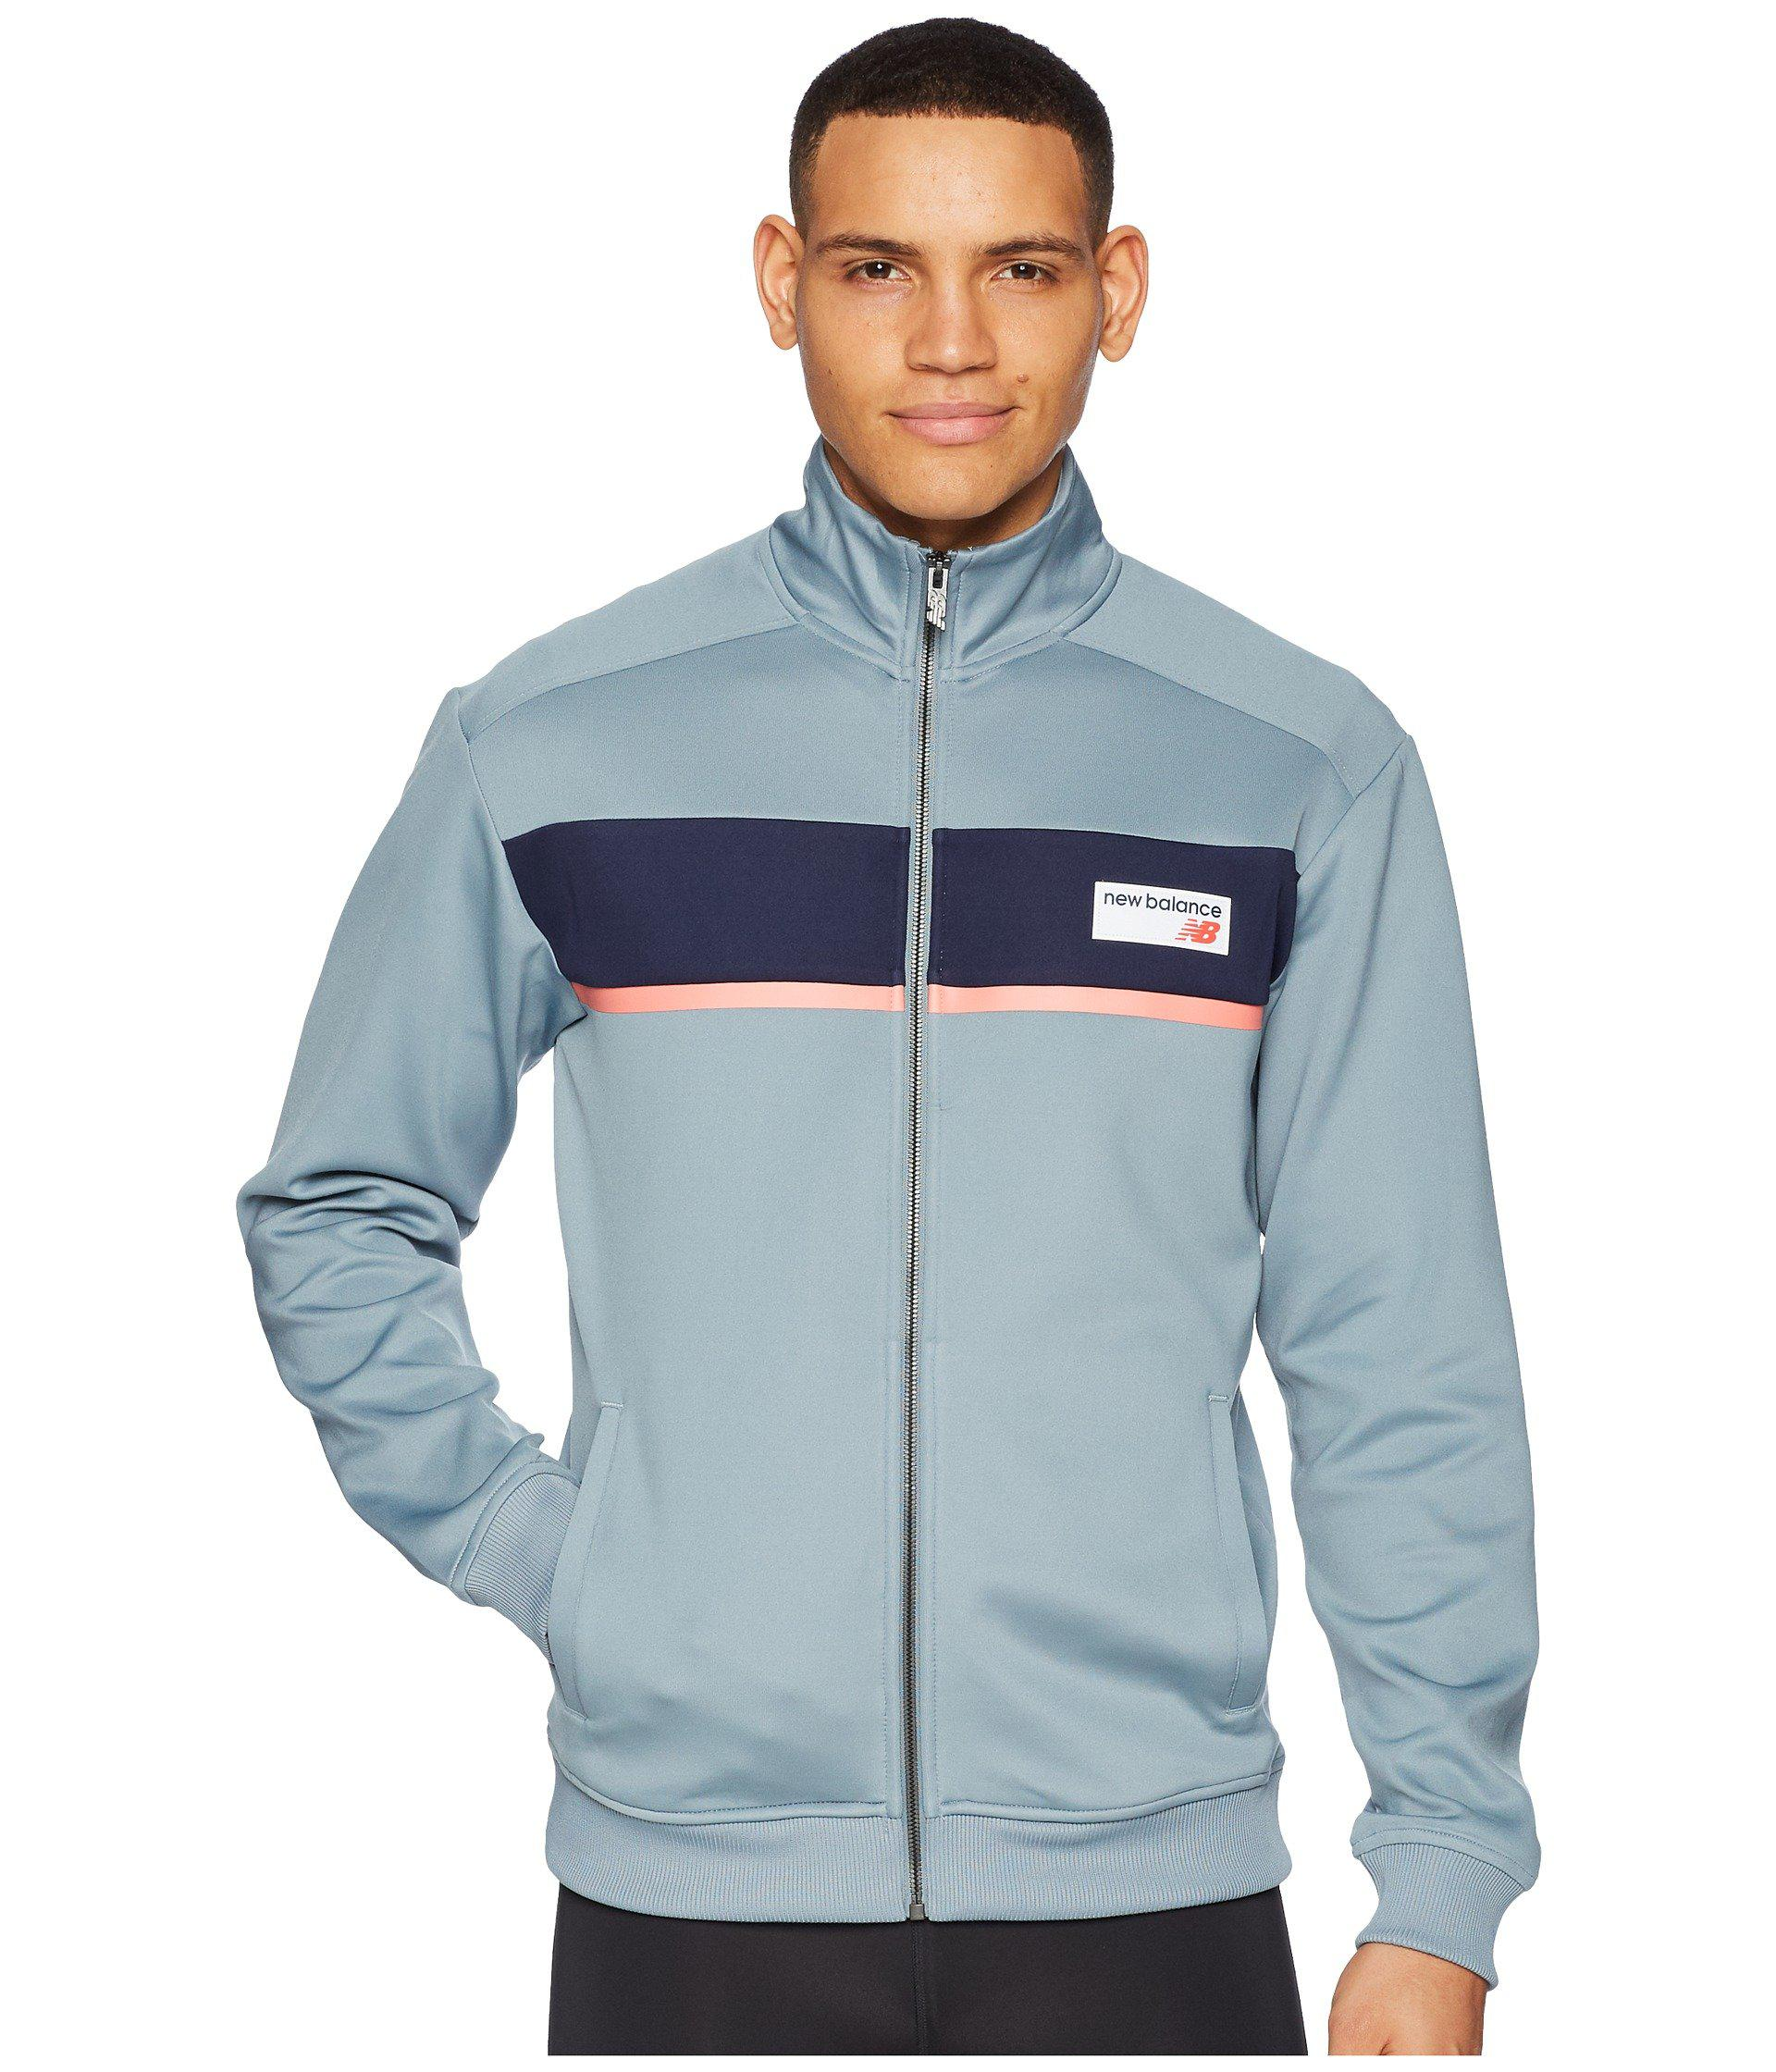 ebd70858fe765 New Balance Nb Athletics Track Jacket in Blue for Men - Lyst